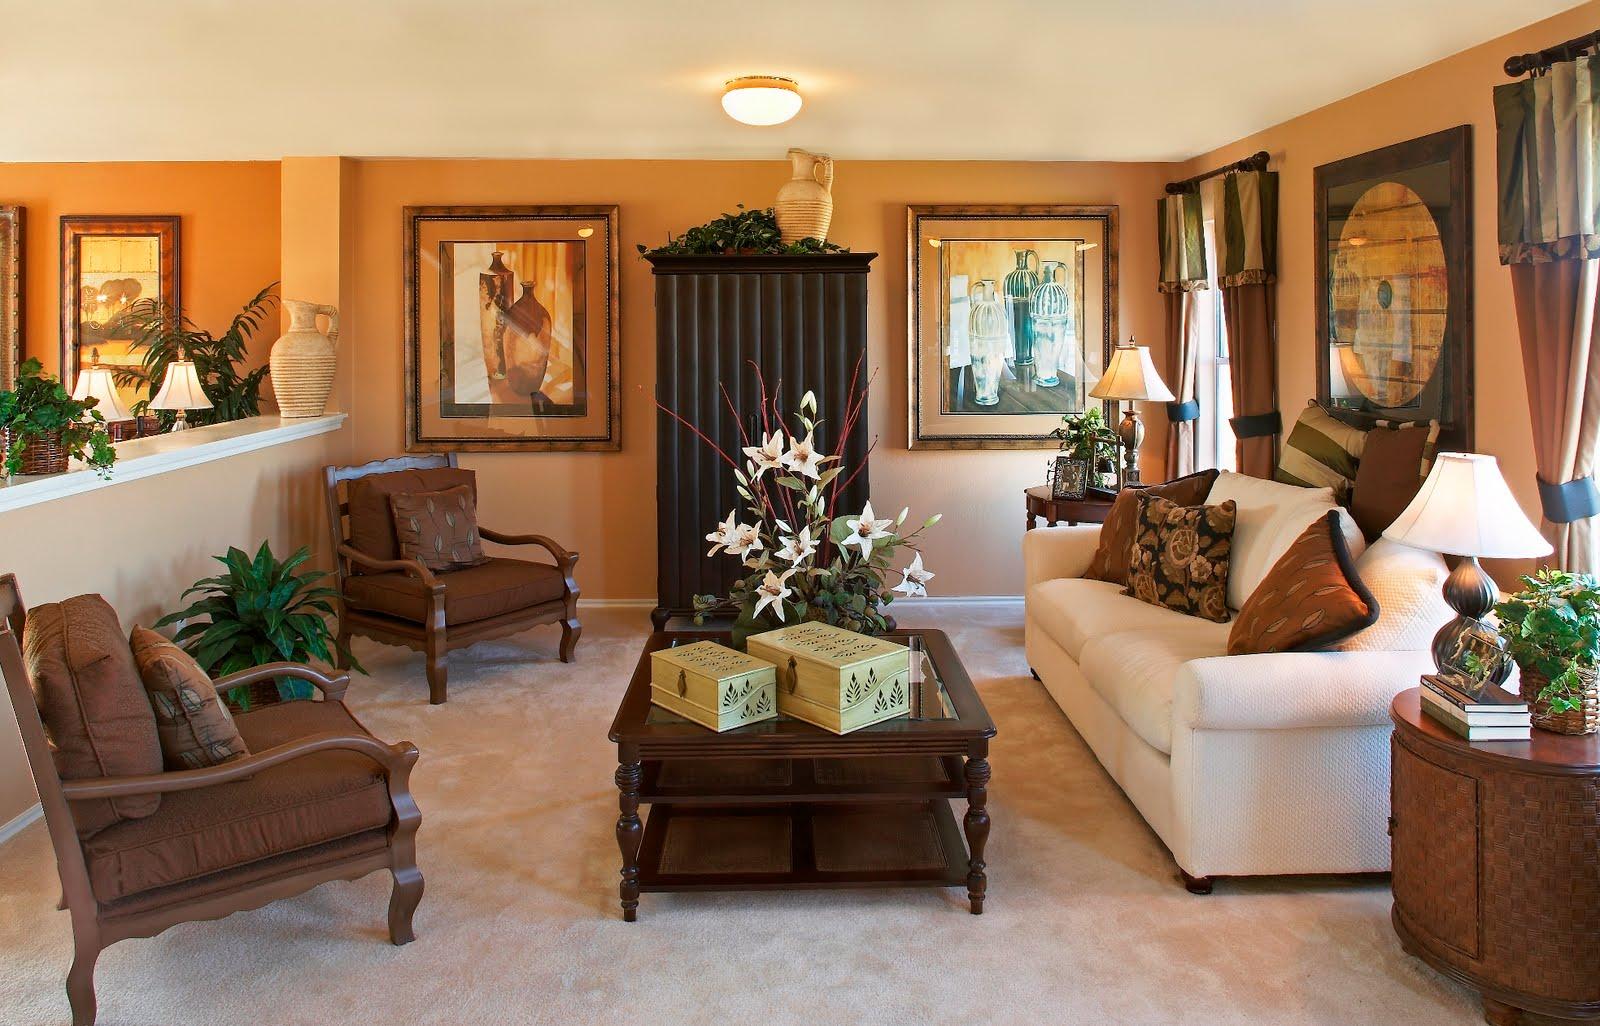 Home Decor Ideas Latest